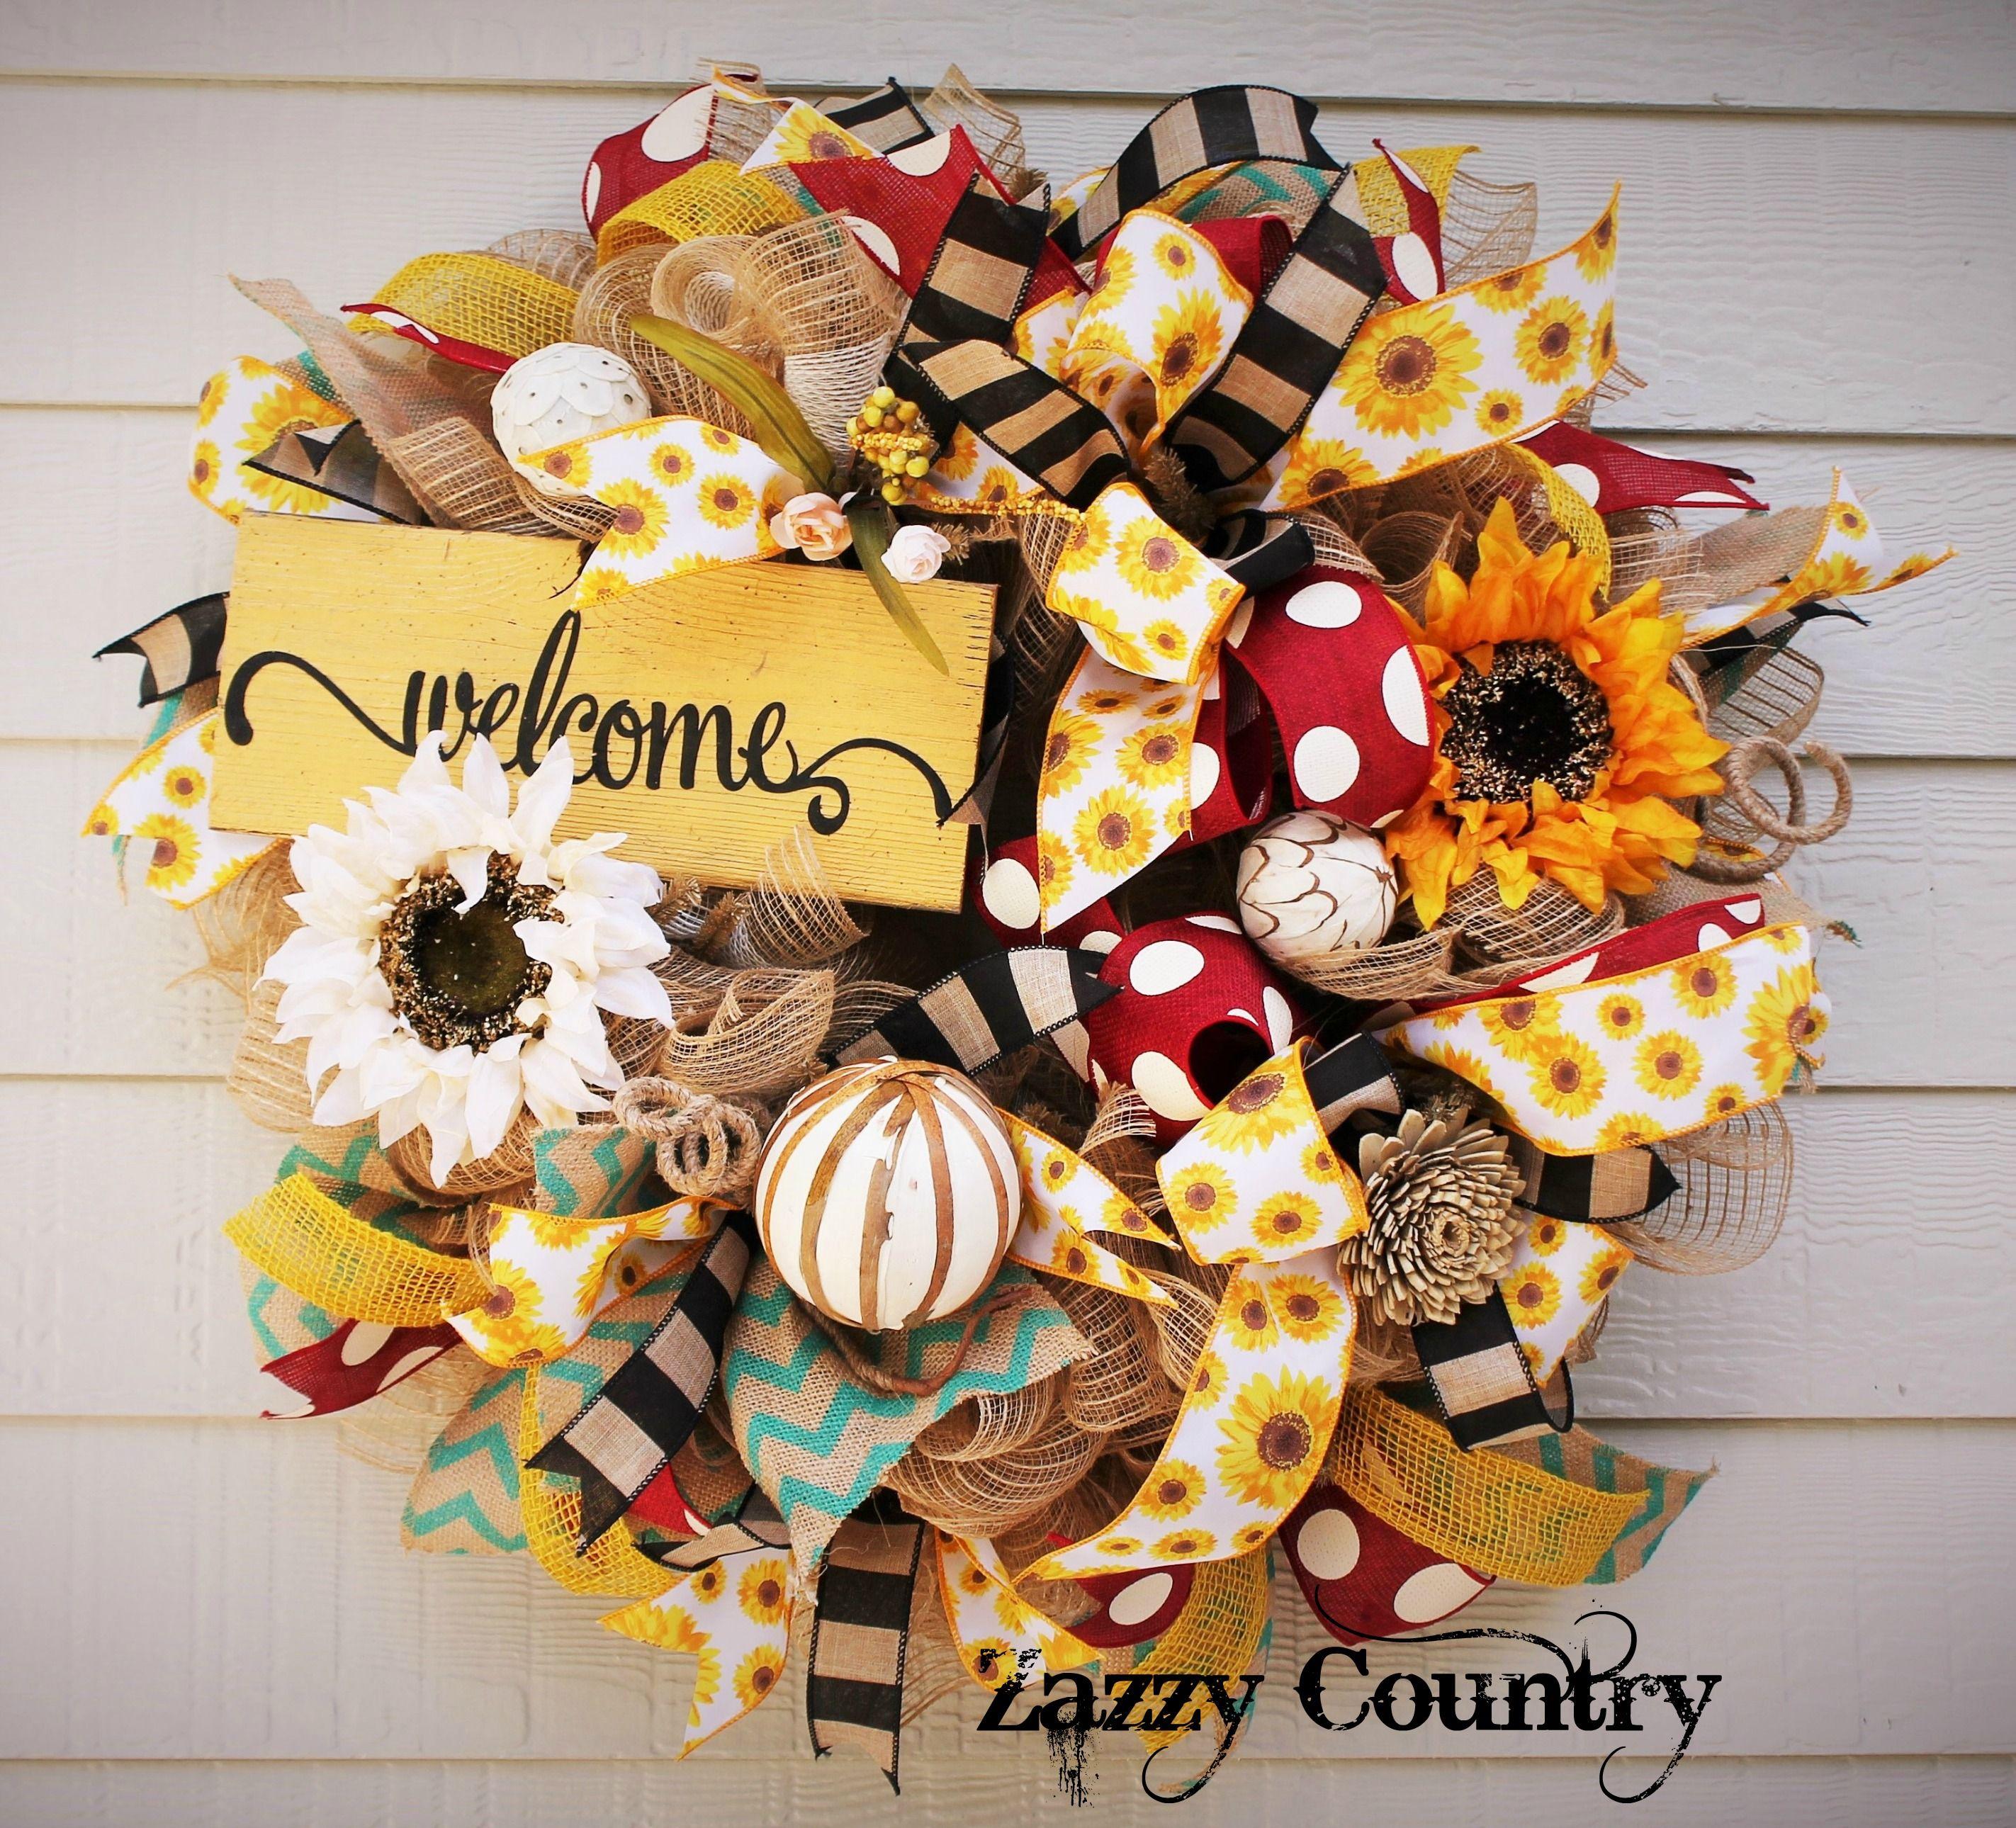 Zazzy Country on Facebook Diy fall wreath, Fall wreaths